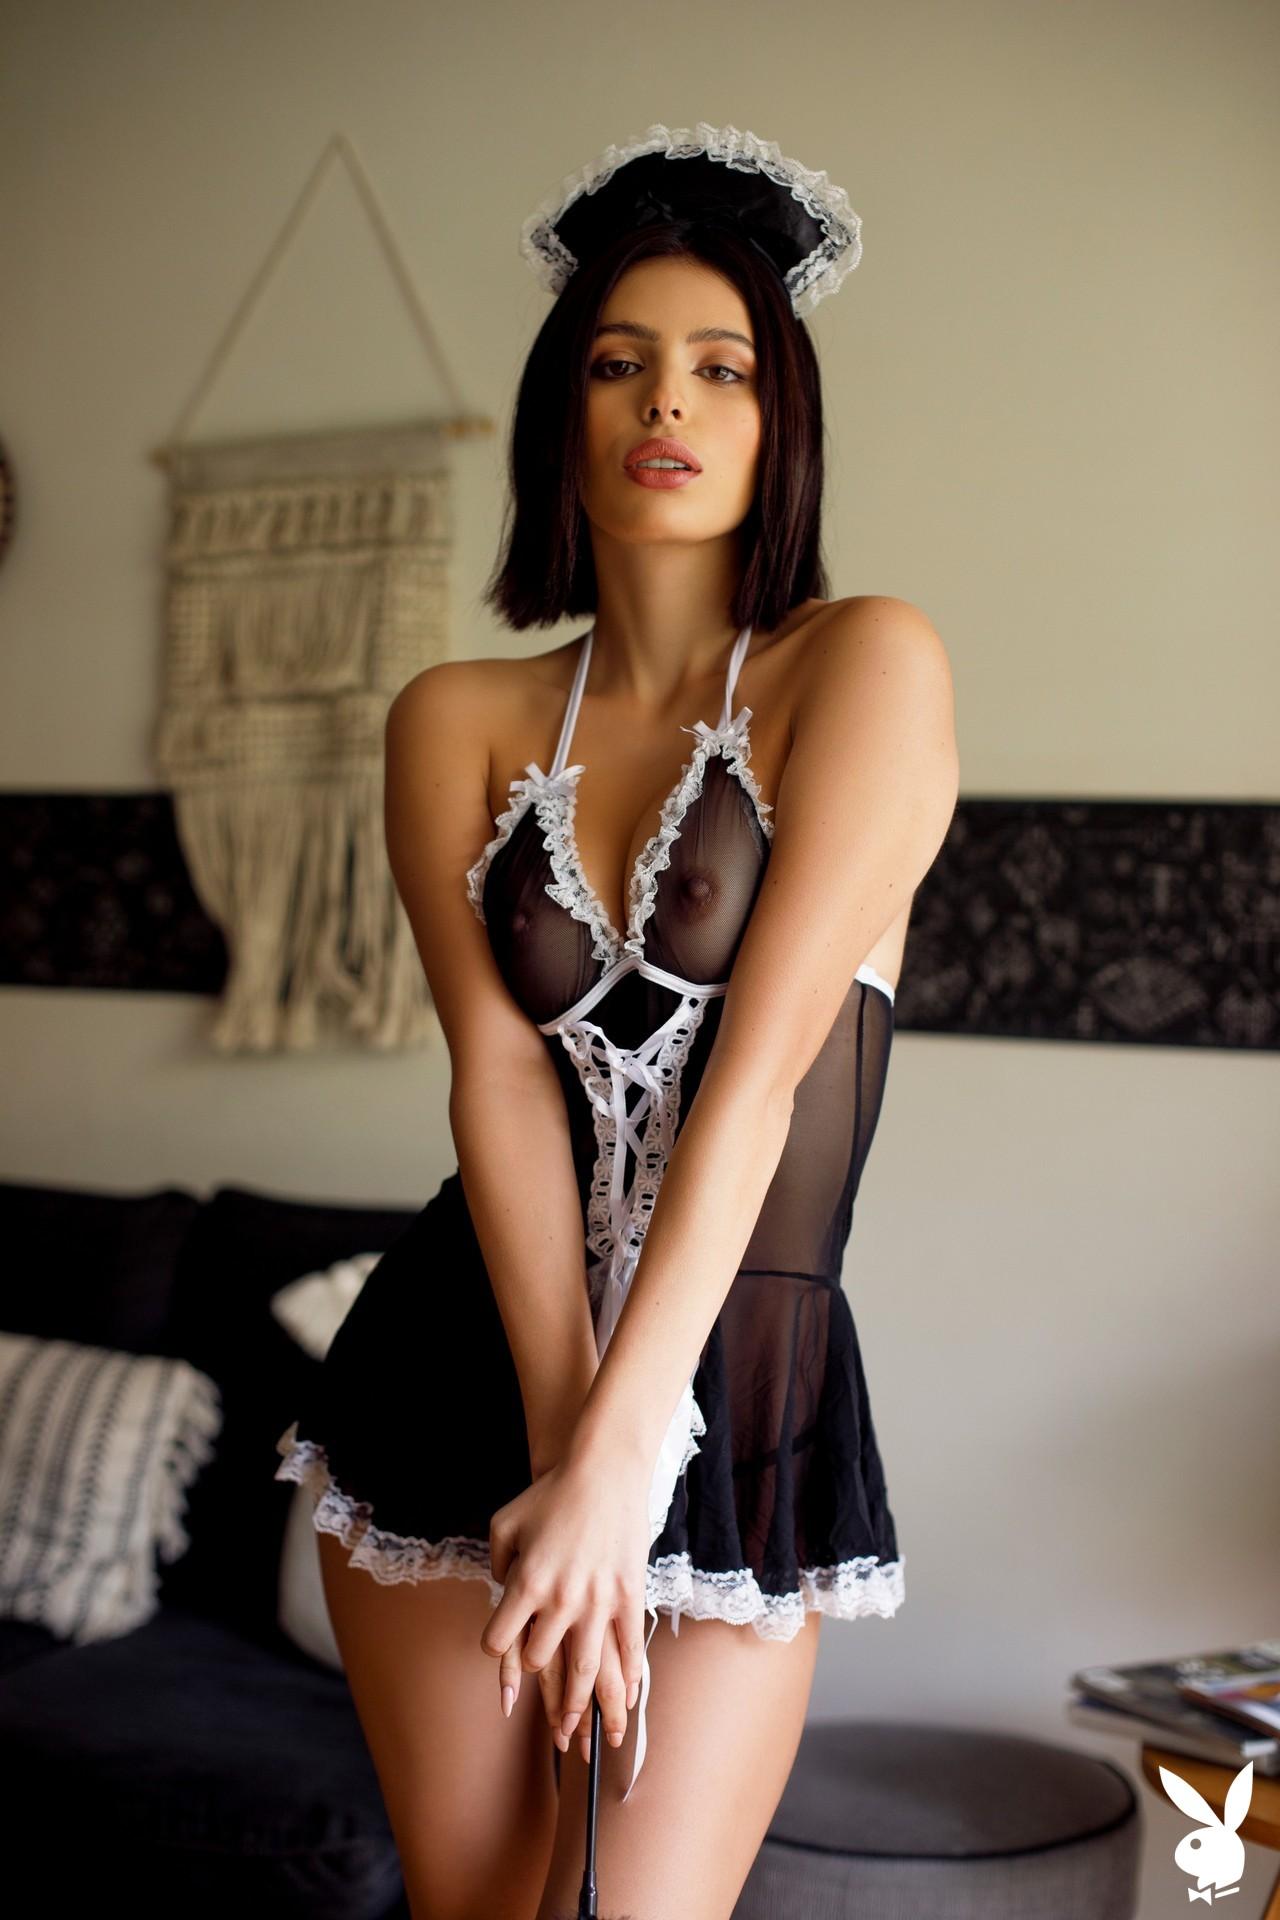 Fernanda Pacheco In Domestic Bliss Playboy Plus (4)